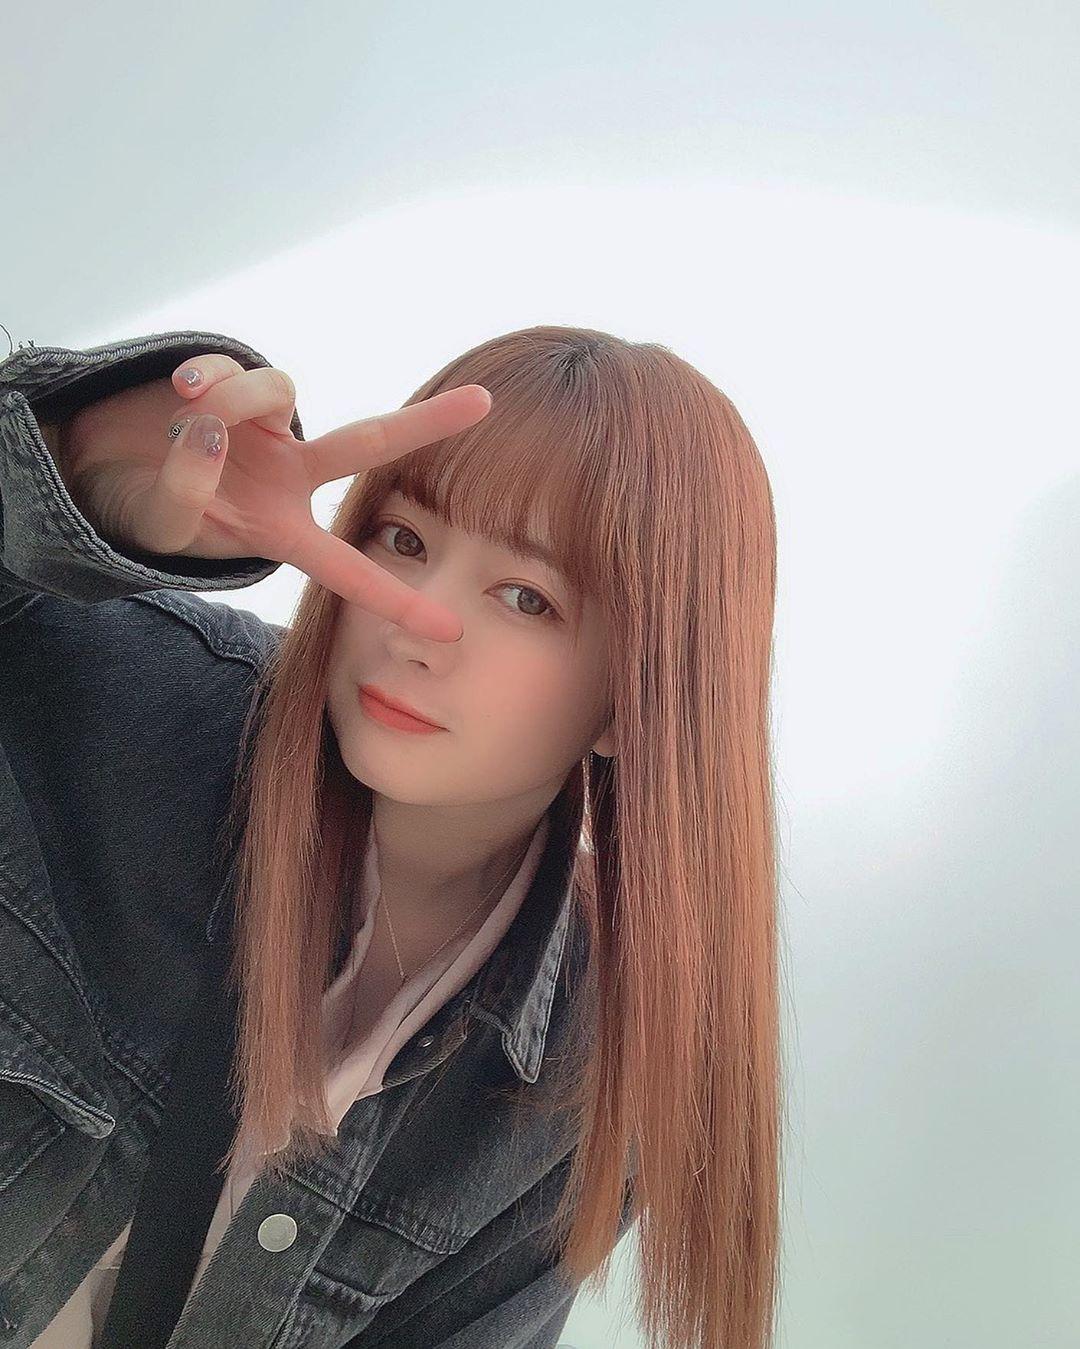 【SKE48】江籠裕奈さん、すごいピンク! 他